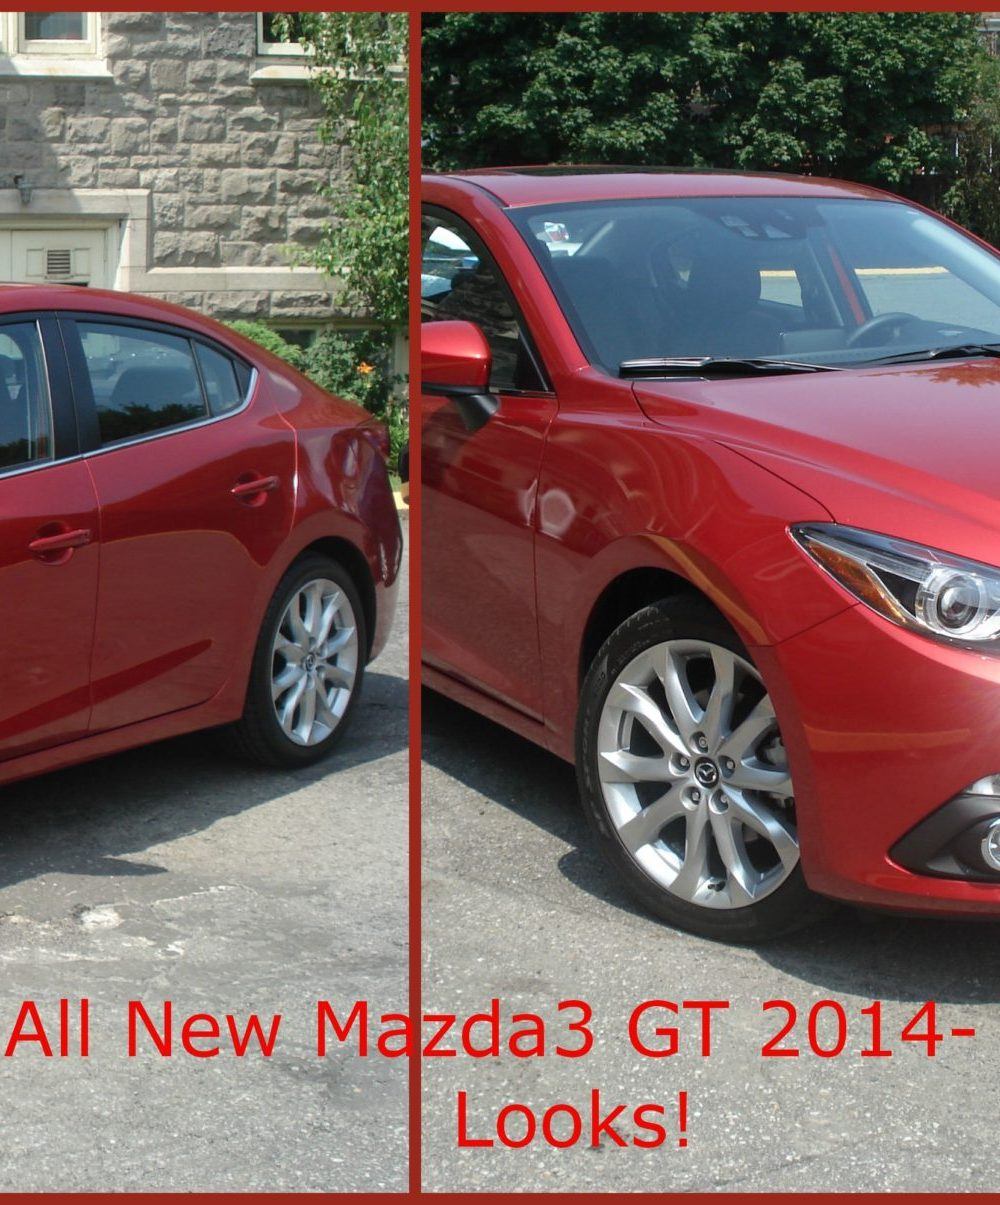 Mazda3 GT 2014- Review